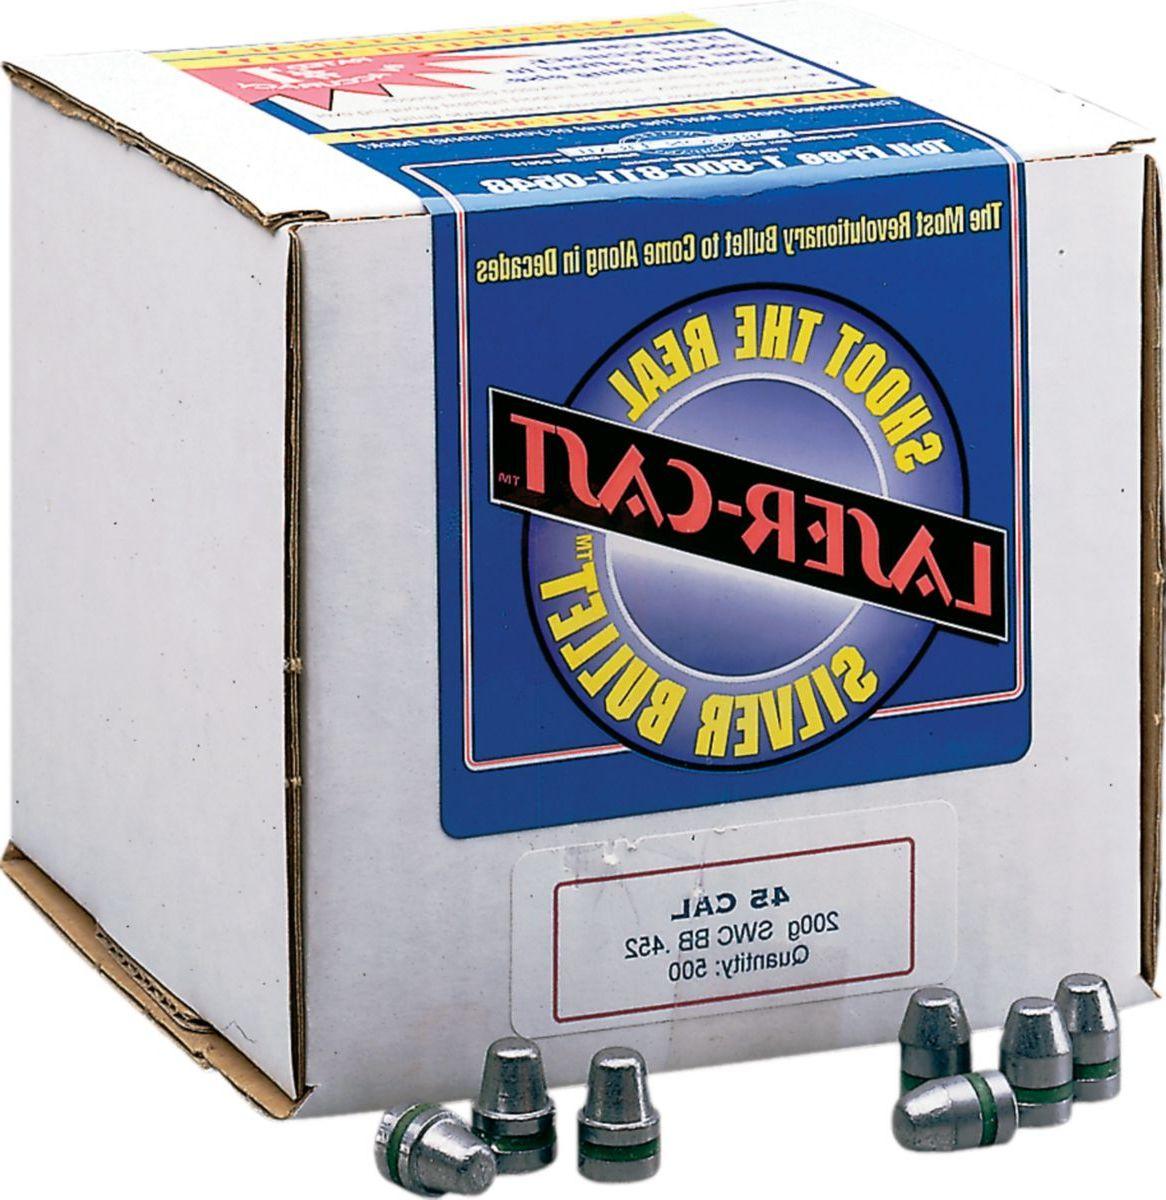 Oregon Trail Laser-Cast™ .45-70 Rifle Bullets – Per 250